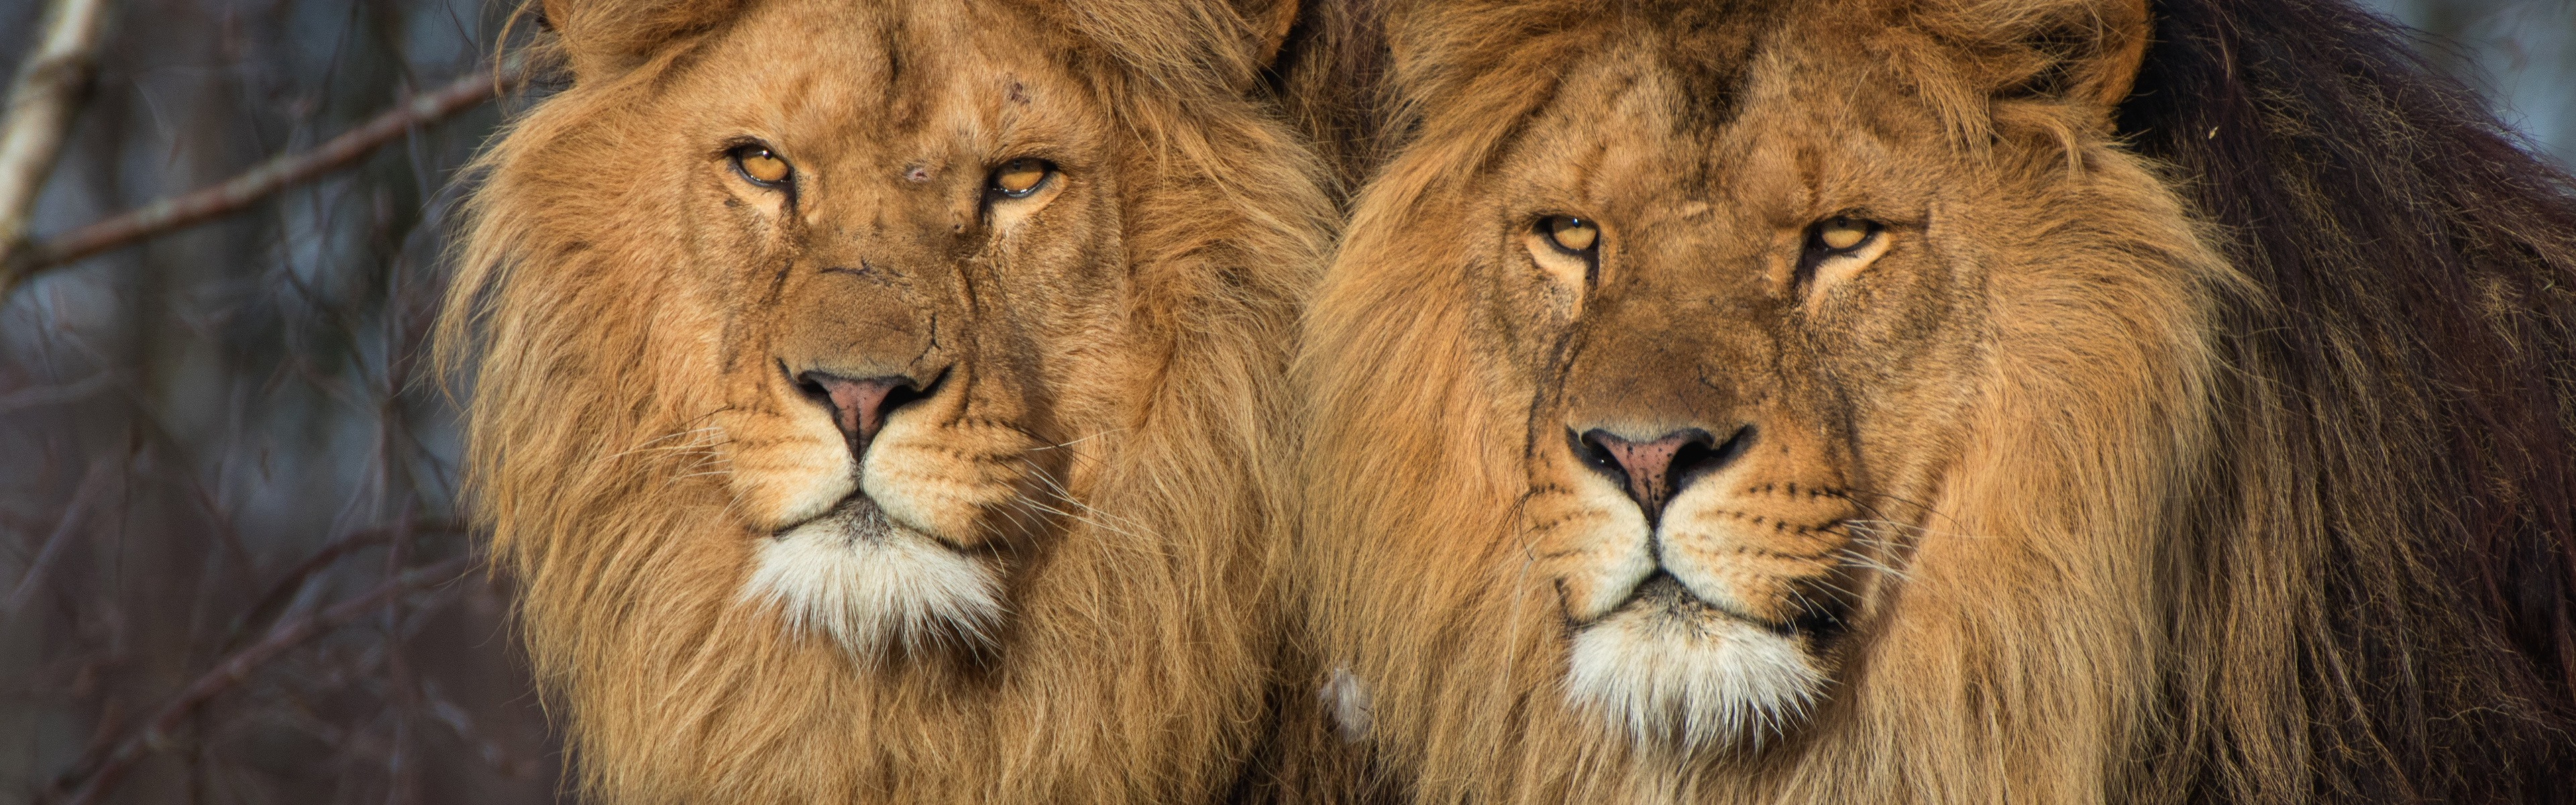 8k Animal Wallpaper Download: Wallpaper Two Lions, Wildlife 3840x2160 UHD 4K Picture, Image